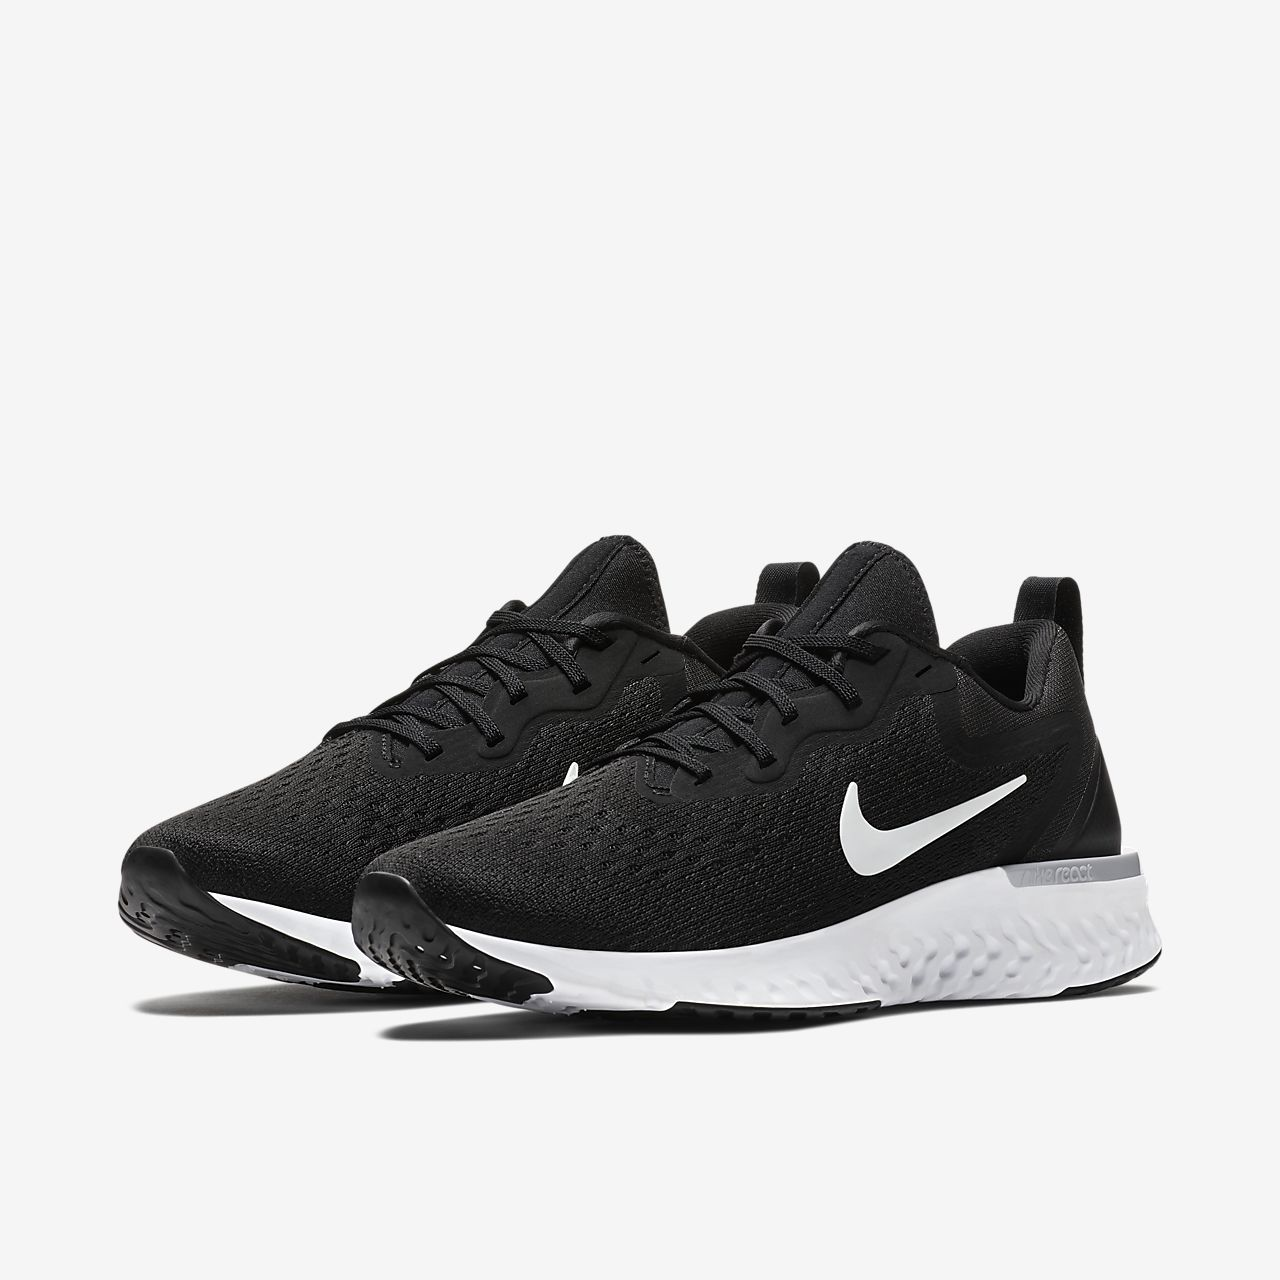 Nike Women's Odyssey React Running Shoe 0gkwfZcwn